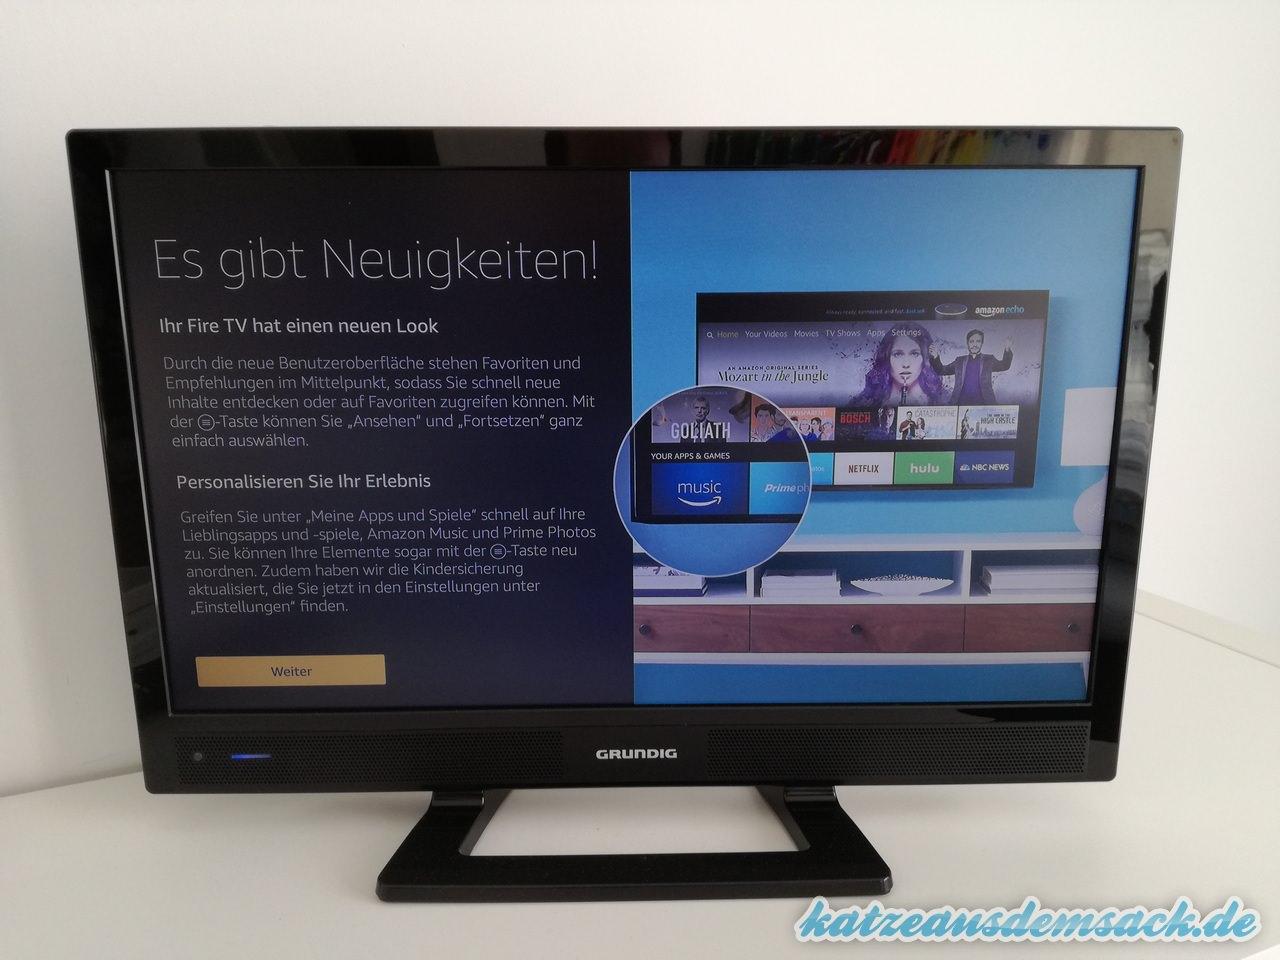 Alexa aud dem Fire TV nutzen - aktuelles Update April 2017 installieren